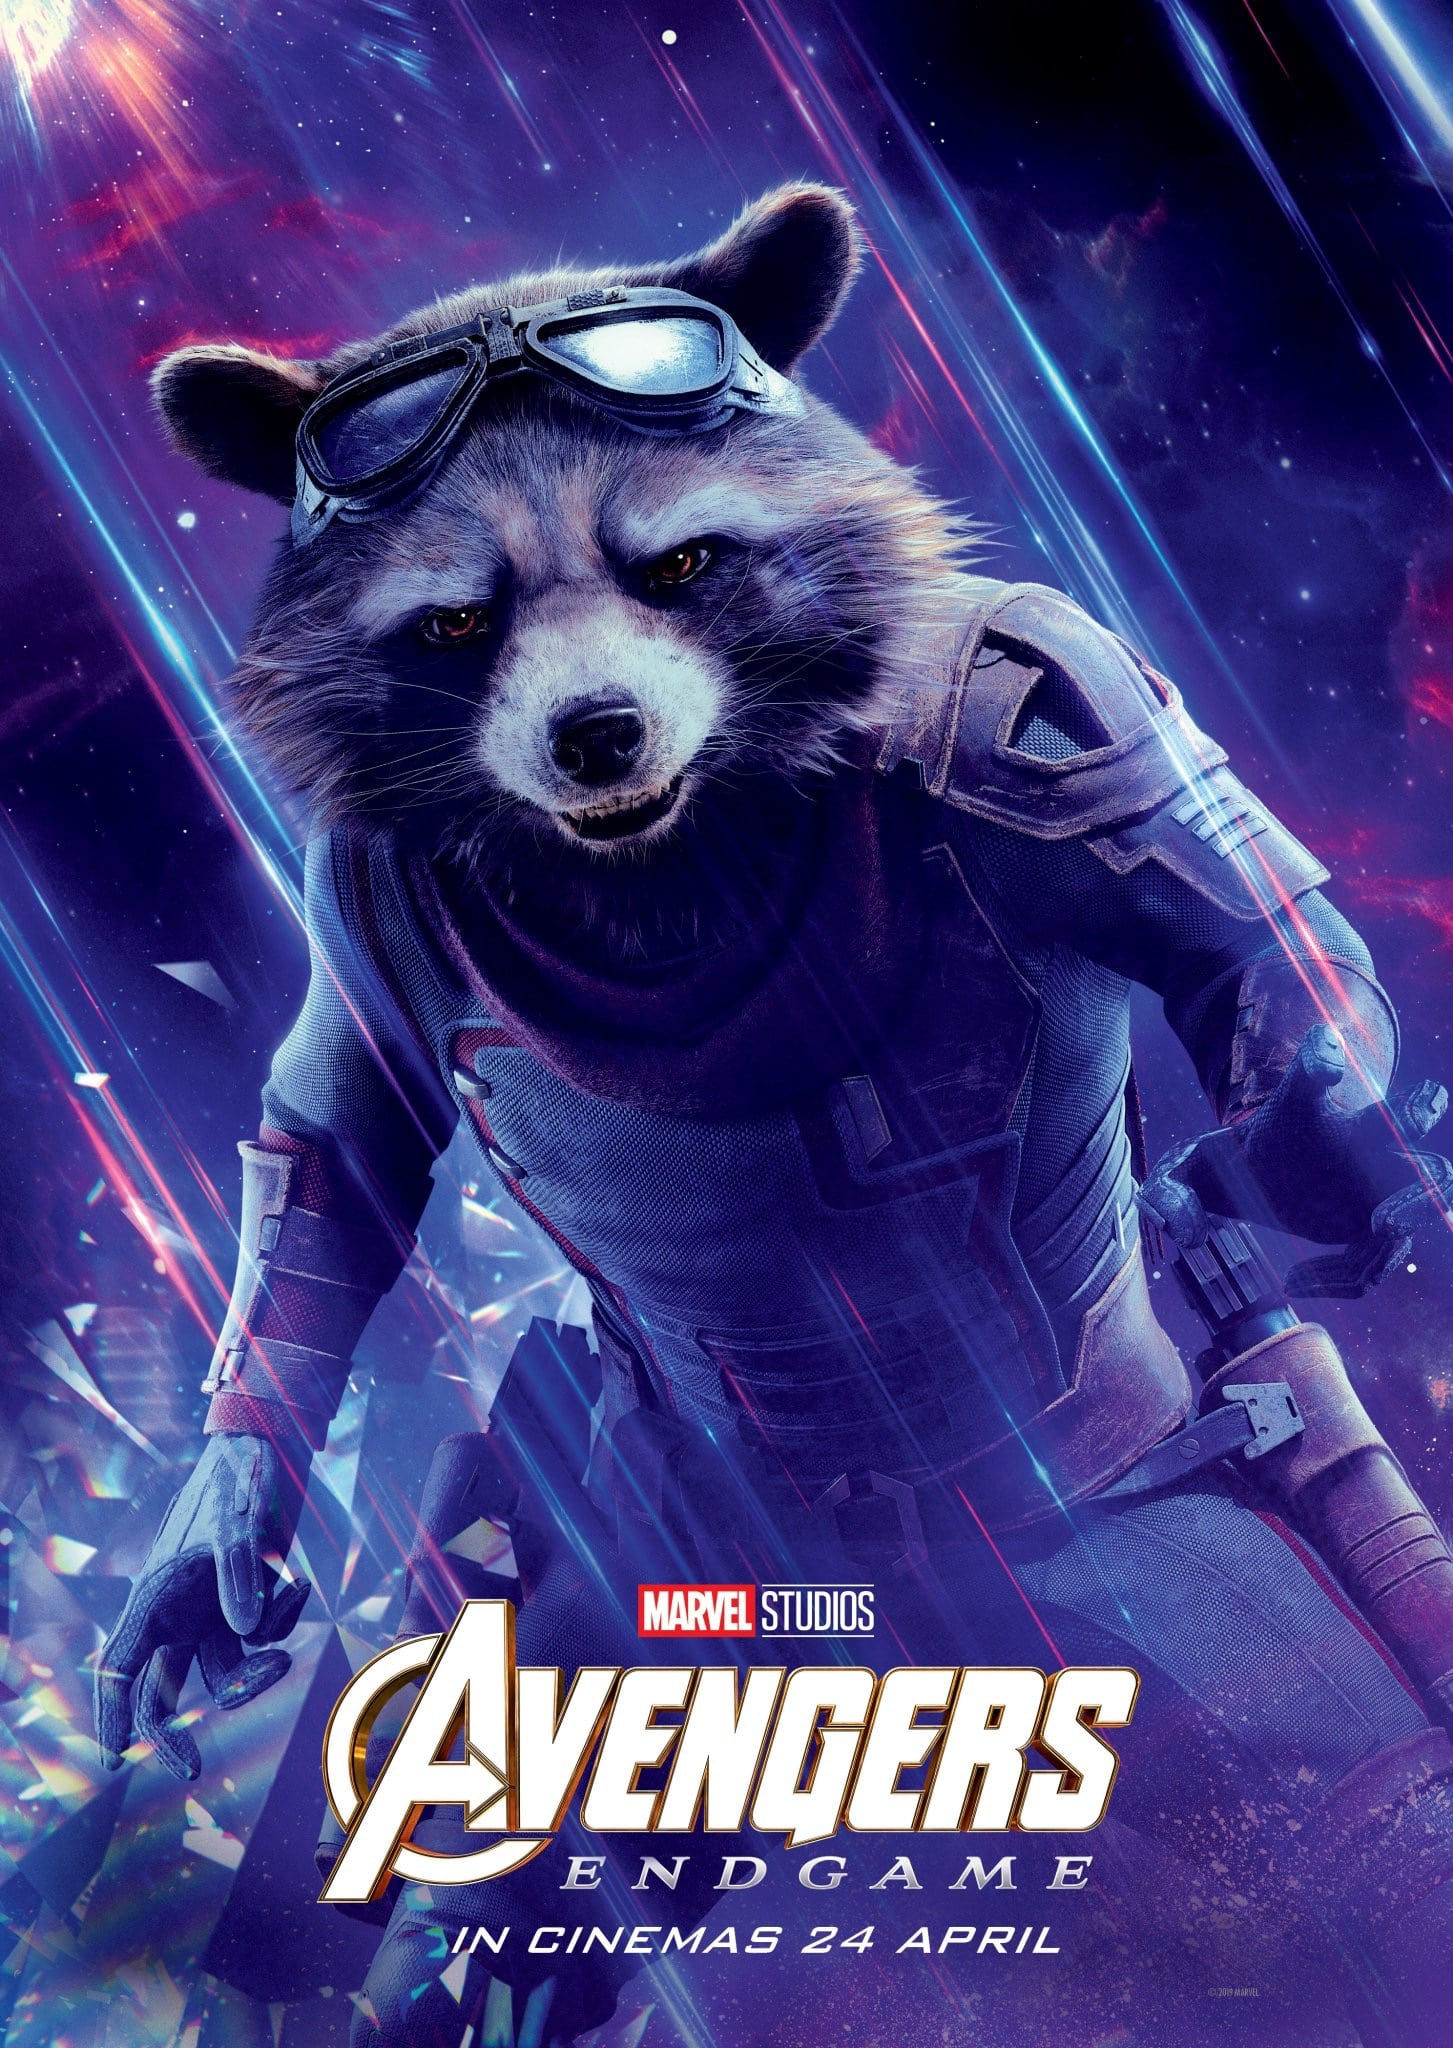 Avengers: Endgame Character Posters (Source: Marvel)